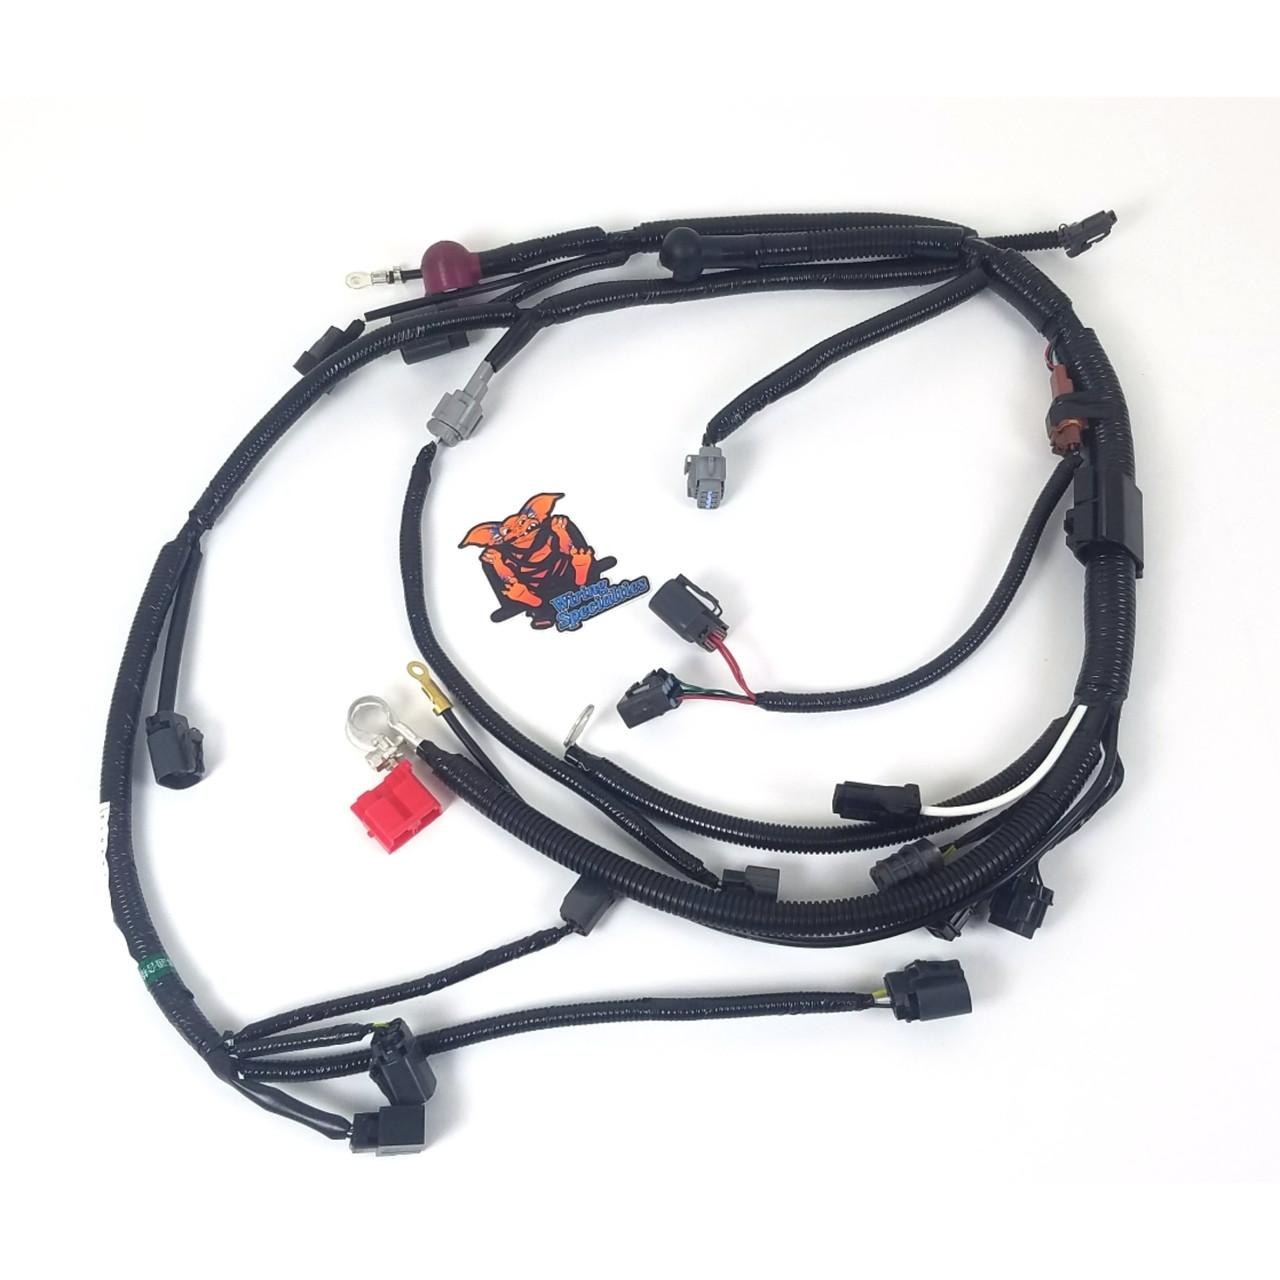 medium resolution of nissan 240sx ka24de wiring harness wiring diagrams lol jeep trailer wiring harness ka24de wiring harness